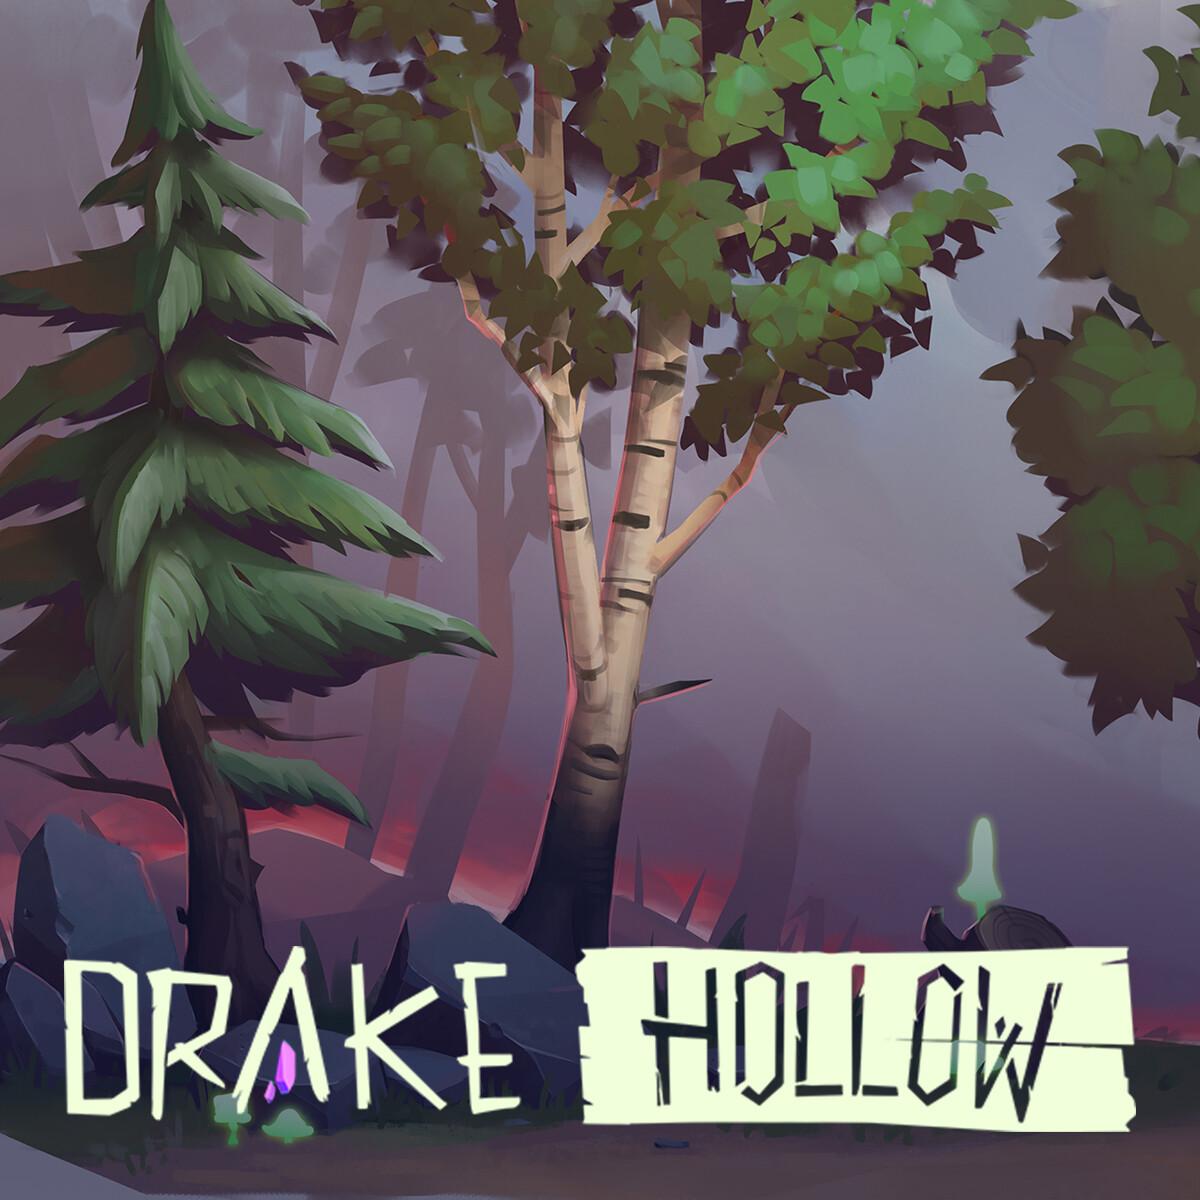 Drake Hollow Concept Art